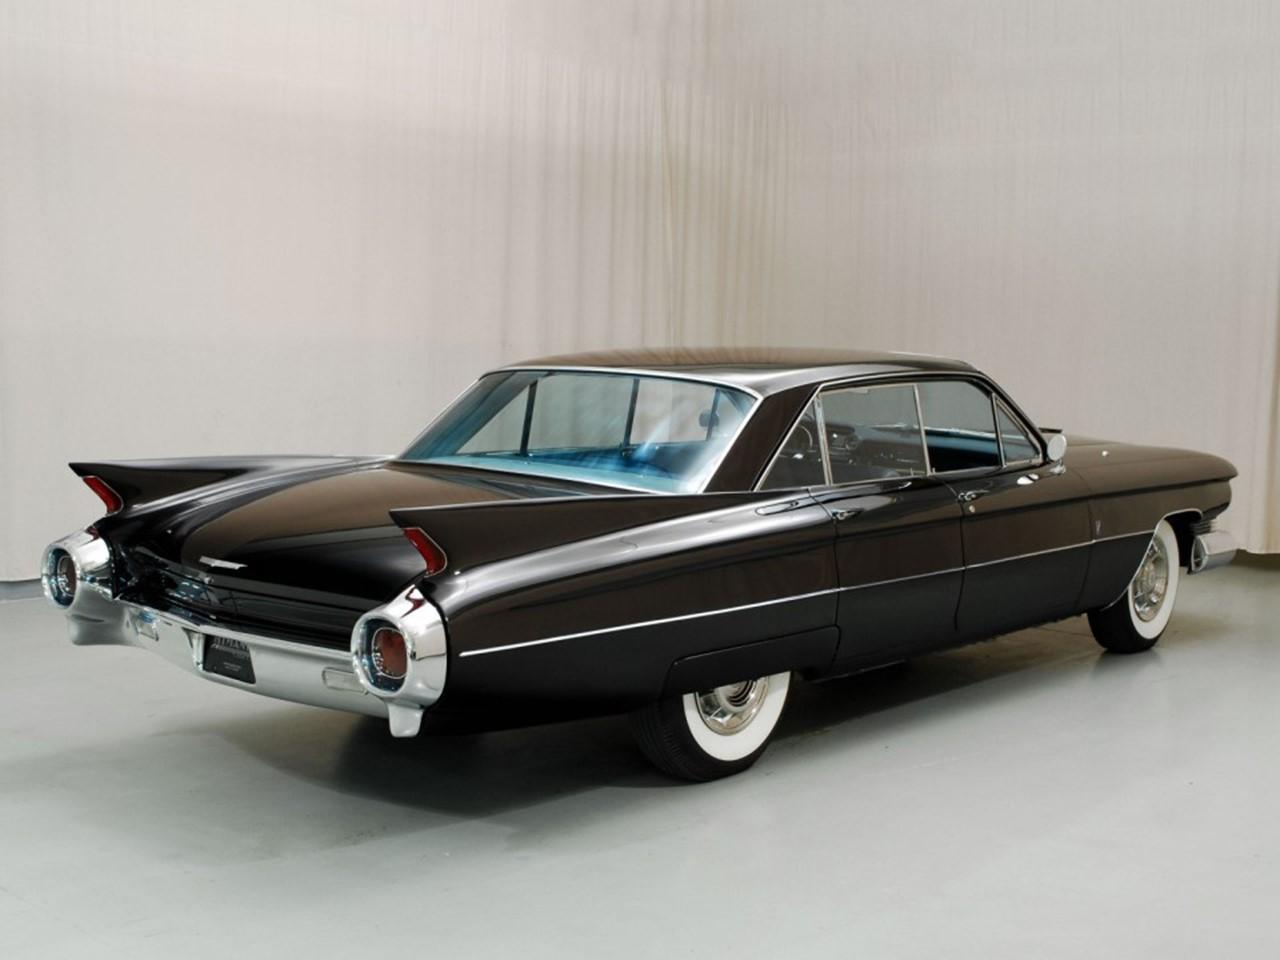 1959 Cadillac Eldorado Brougham Backgrounds, Compatible - PC, Mobile, Gadgets| 1280x960 px